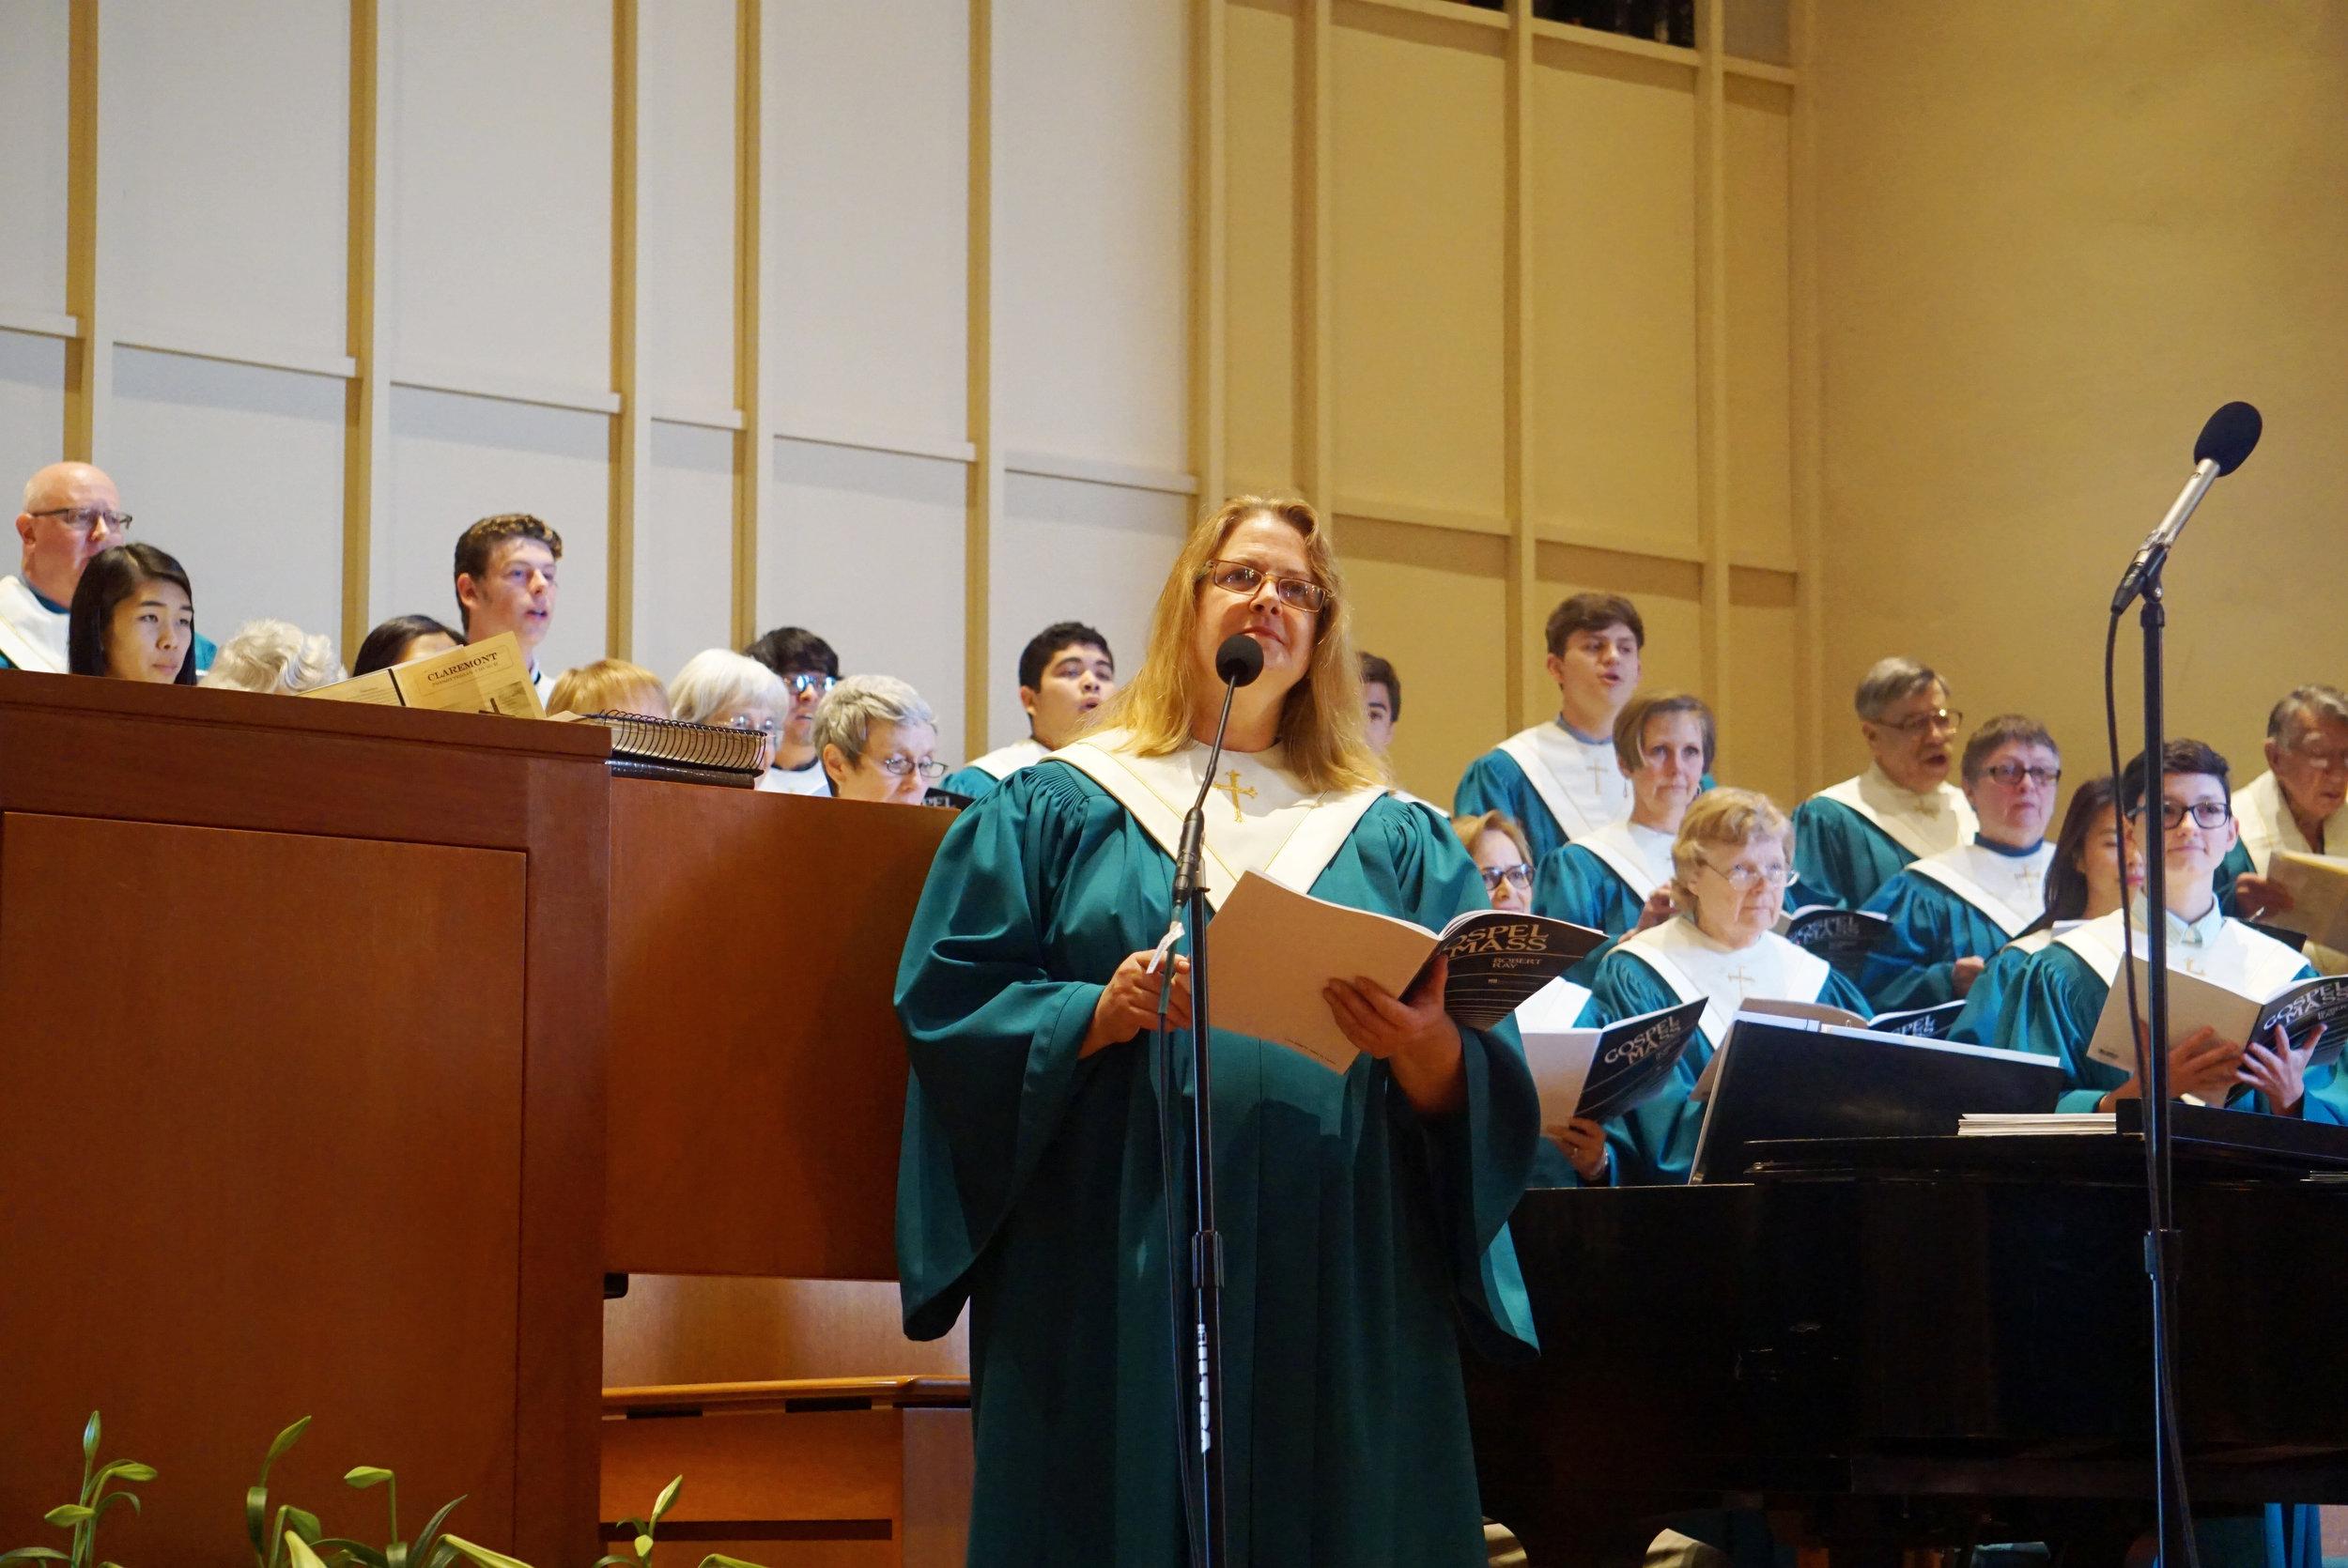 claremont-presbyterian-church-choir-easter-5.jpg